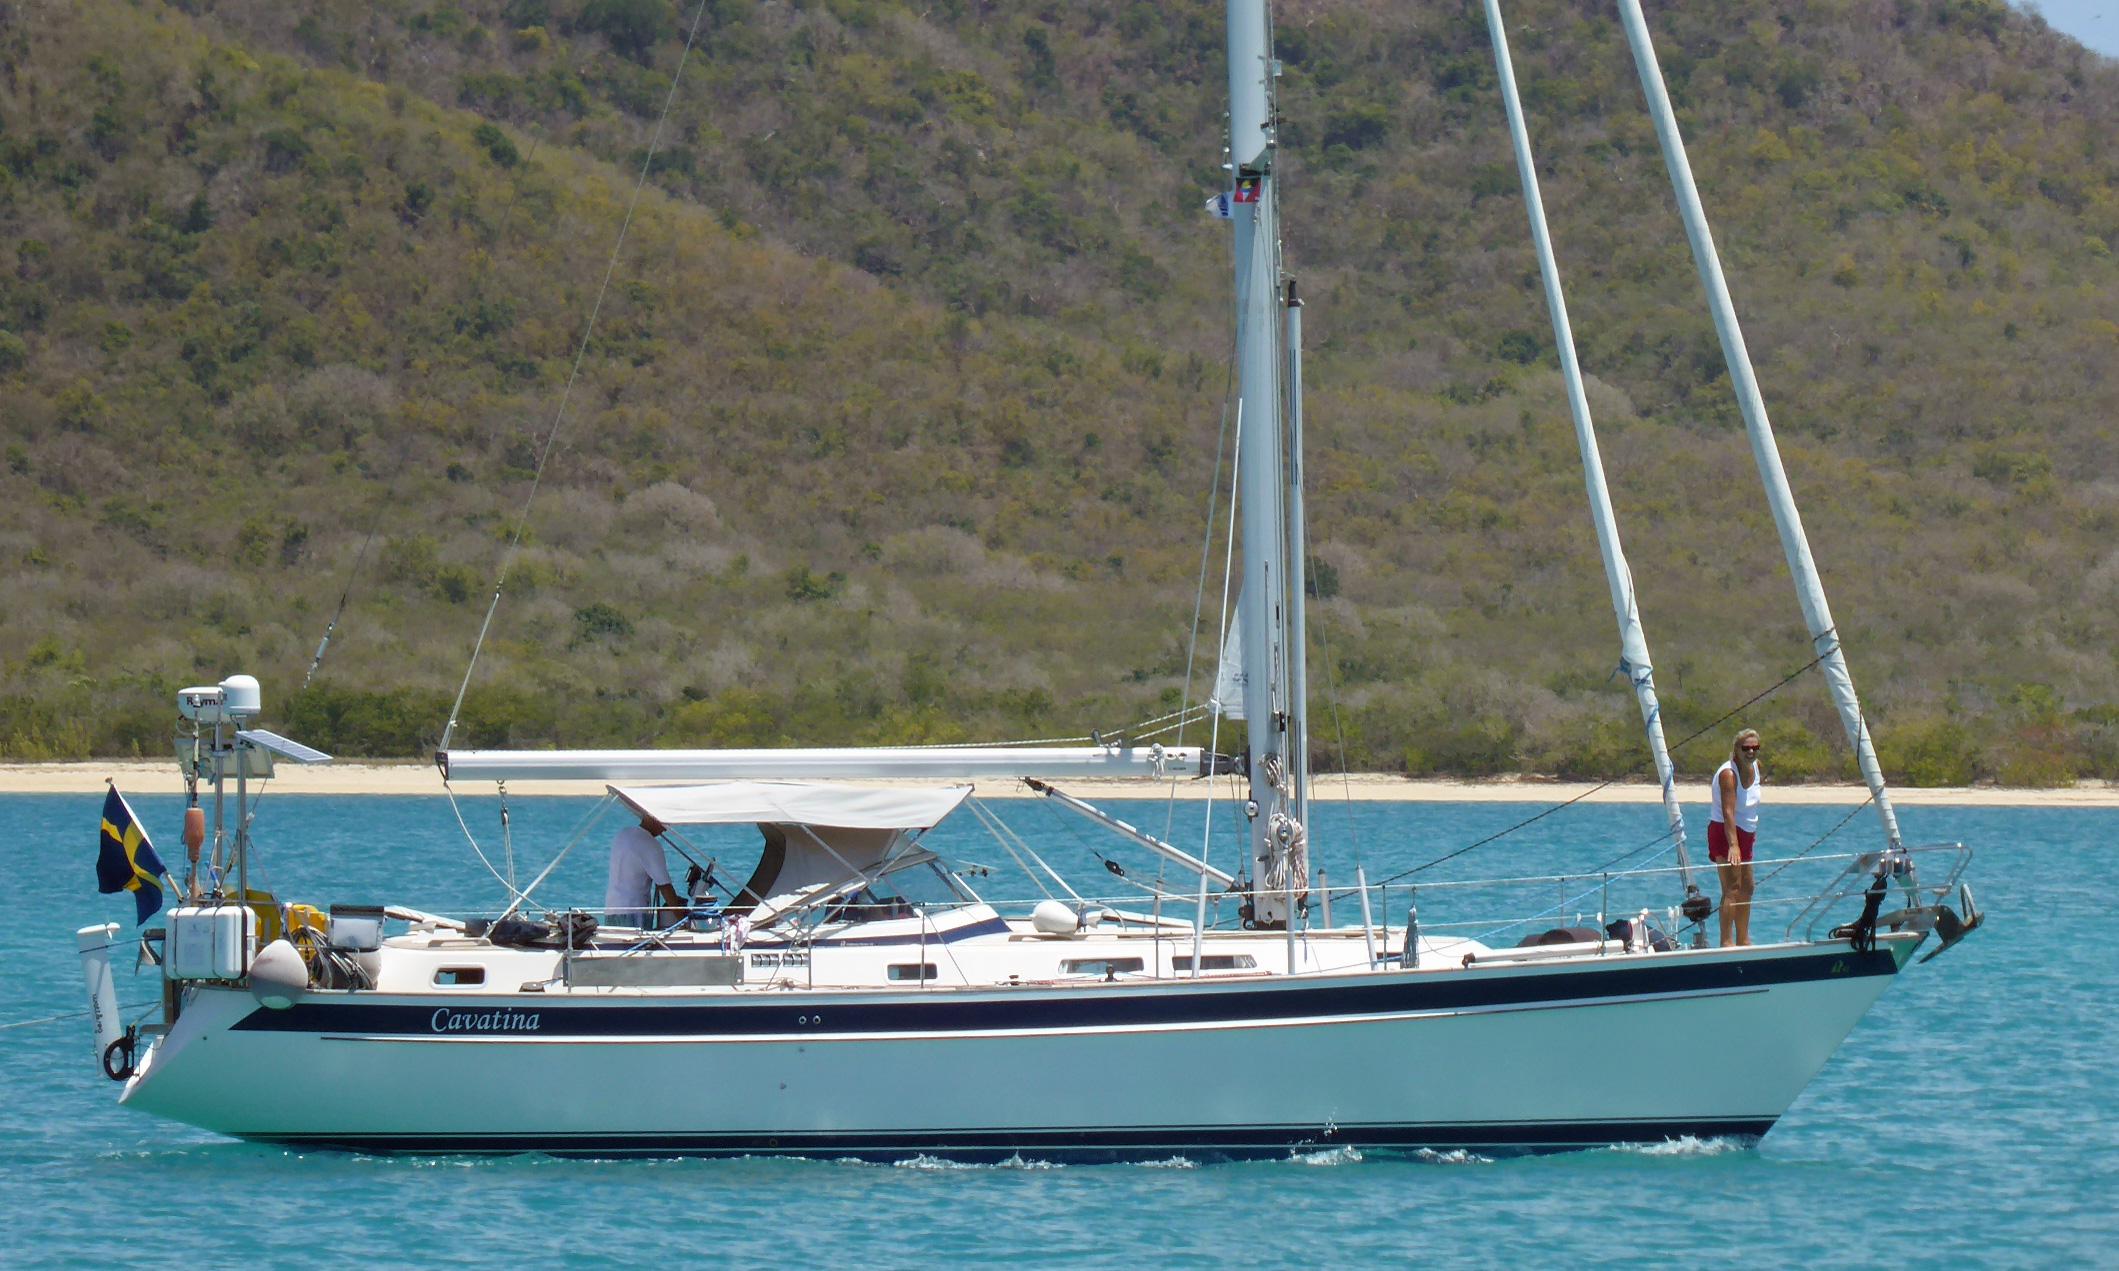 A Hallberg-Rassy 42 cruising yacht